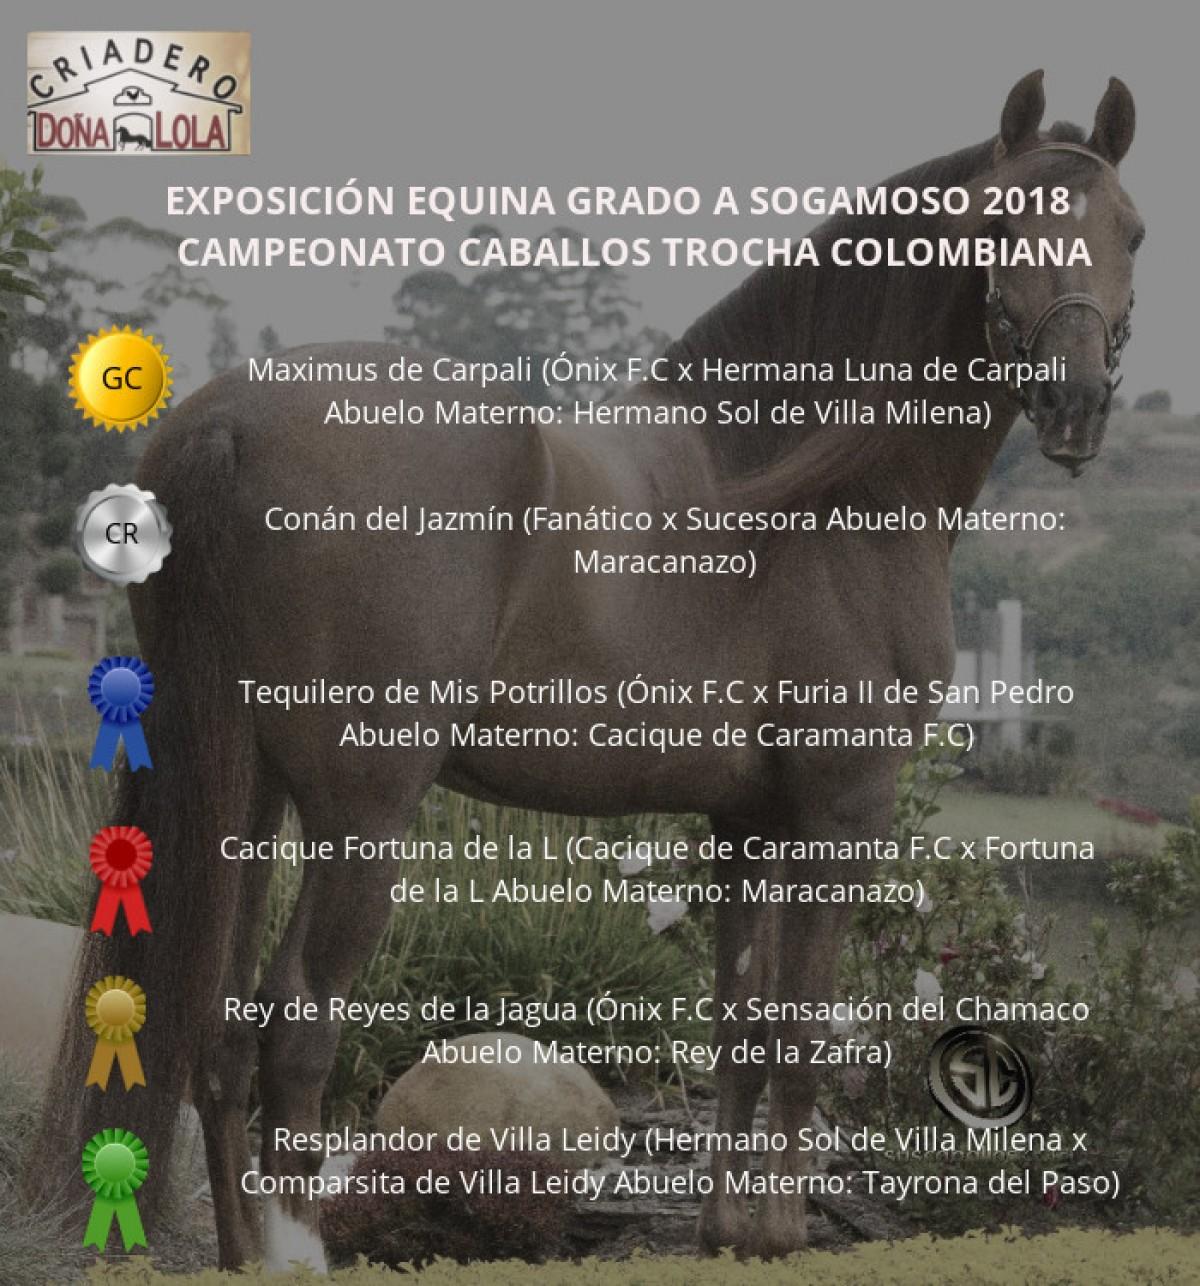 RESULTADOS Exposición Equina Grado A Sogamoso 2018 - TROCHA COLOMBIANA